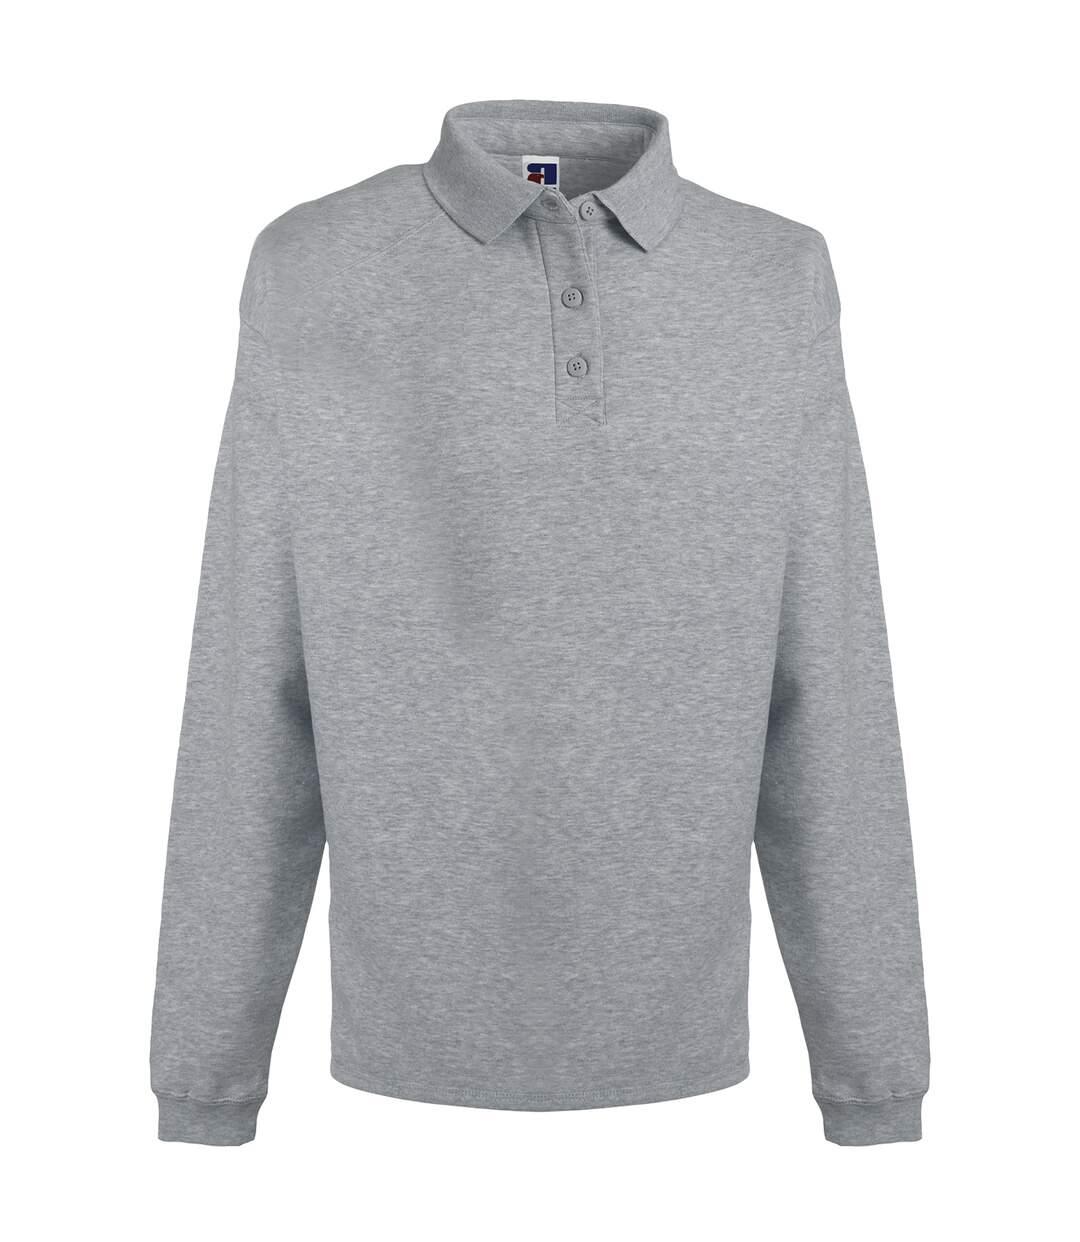 Russell Europe Mens Heavy Duty Collar Sweatshirt (French Navy) - UTRW3275